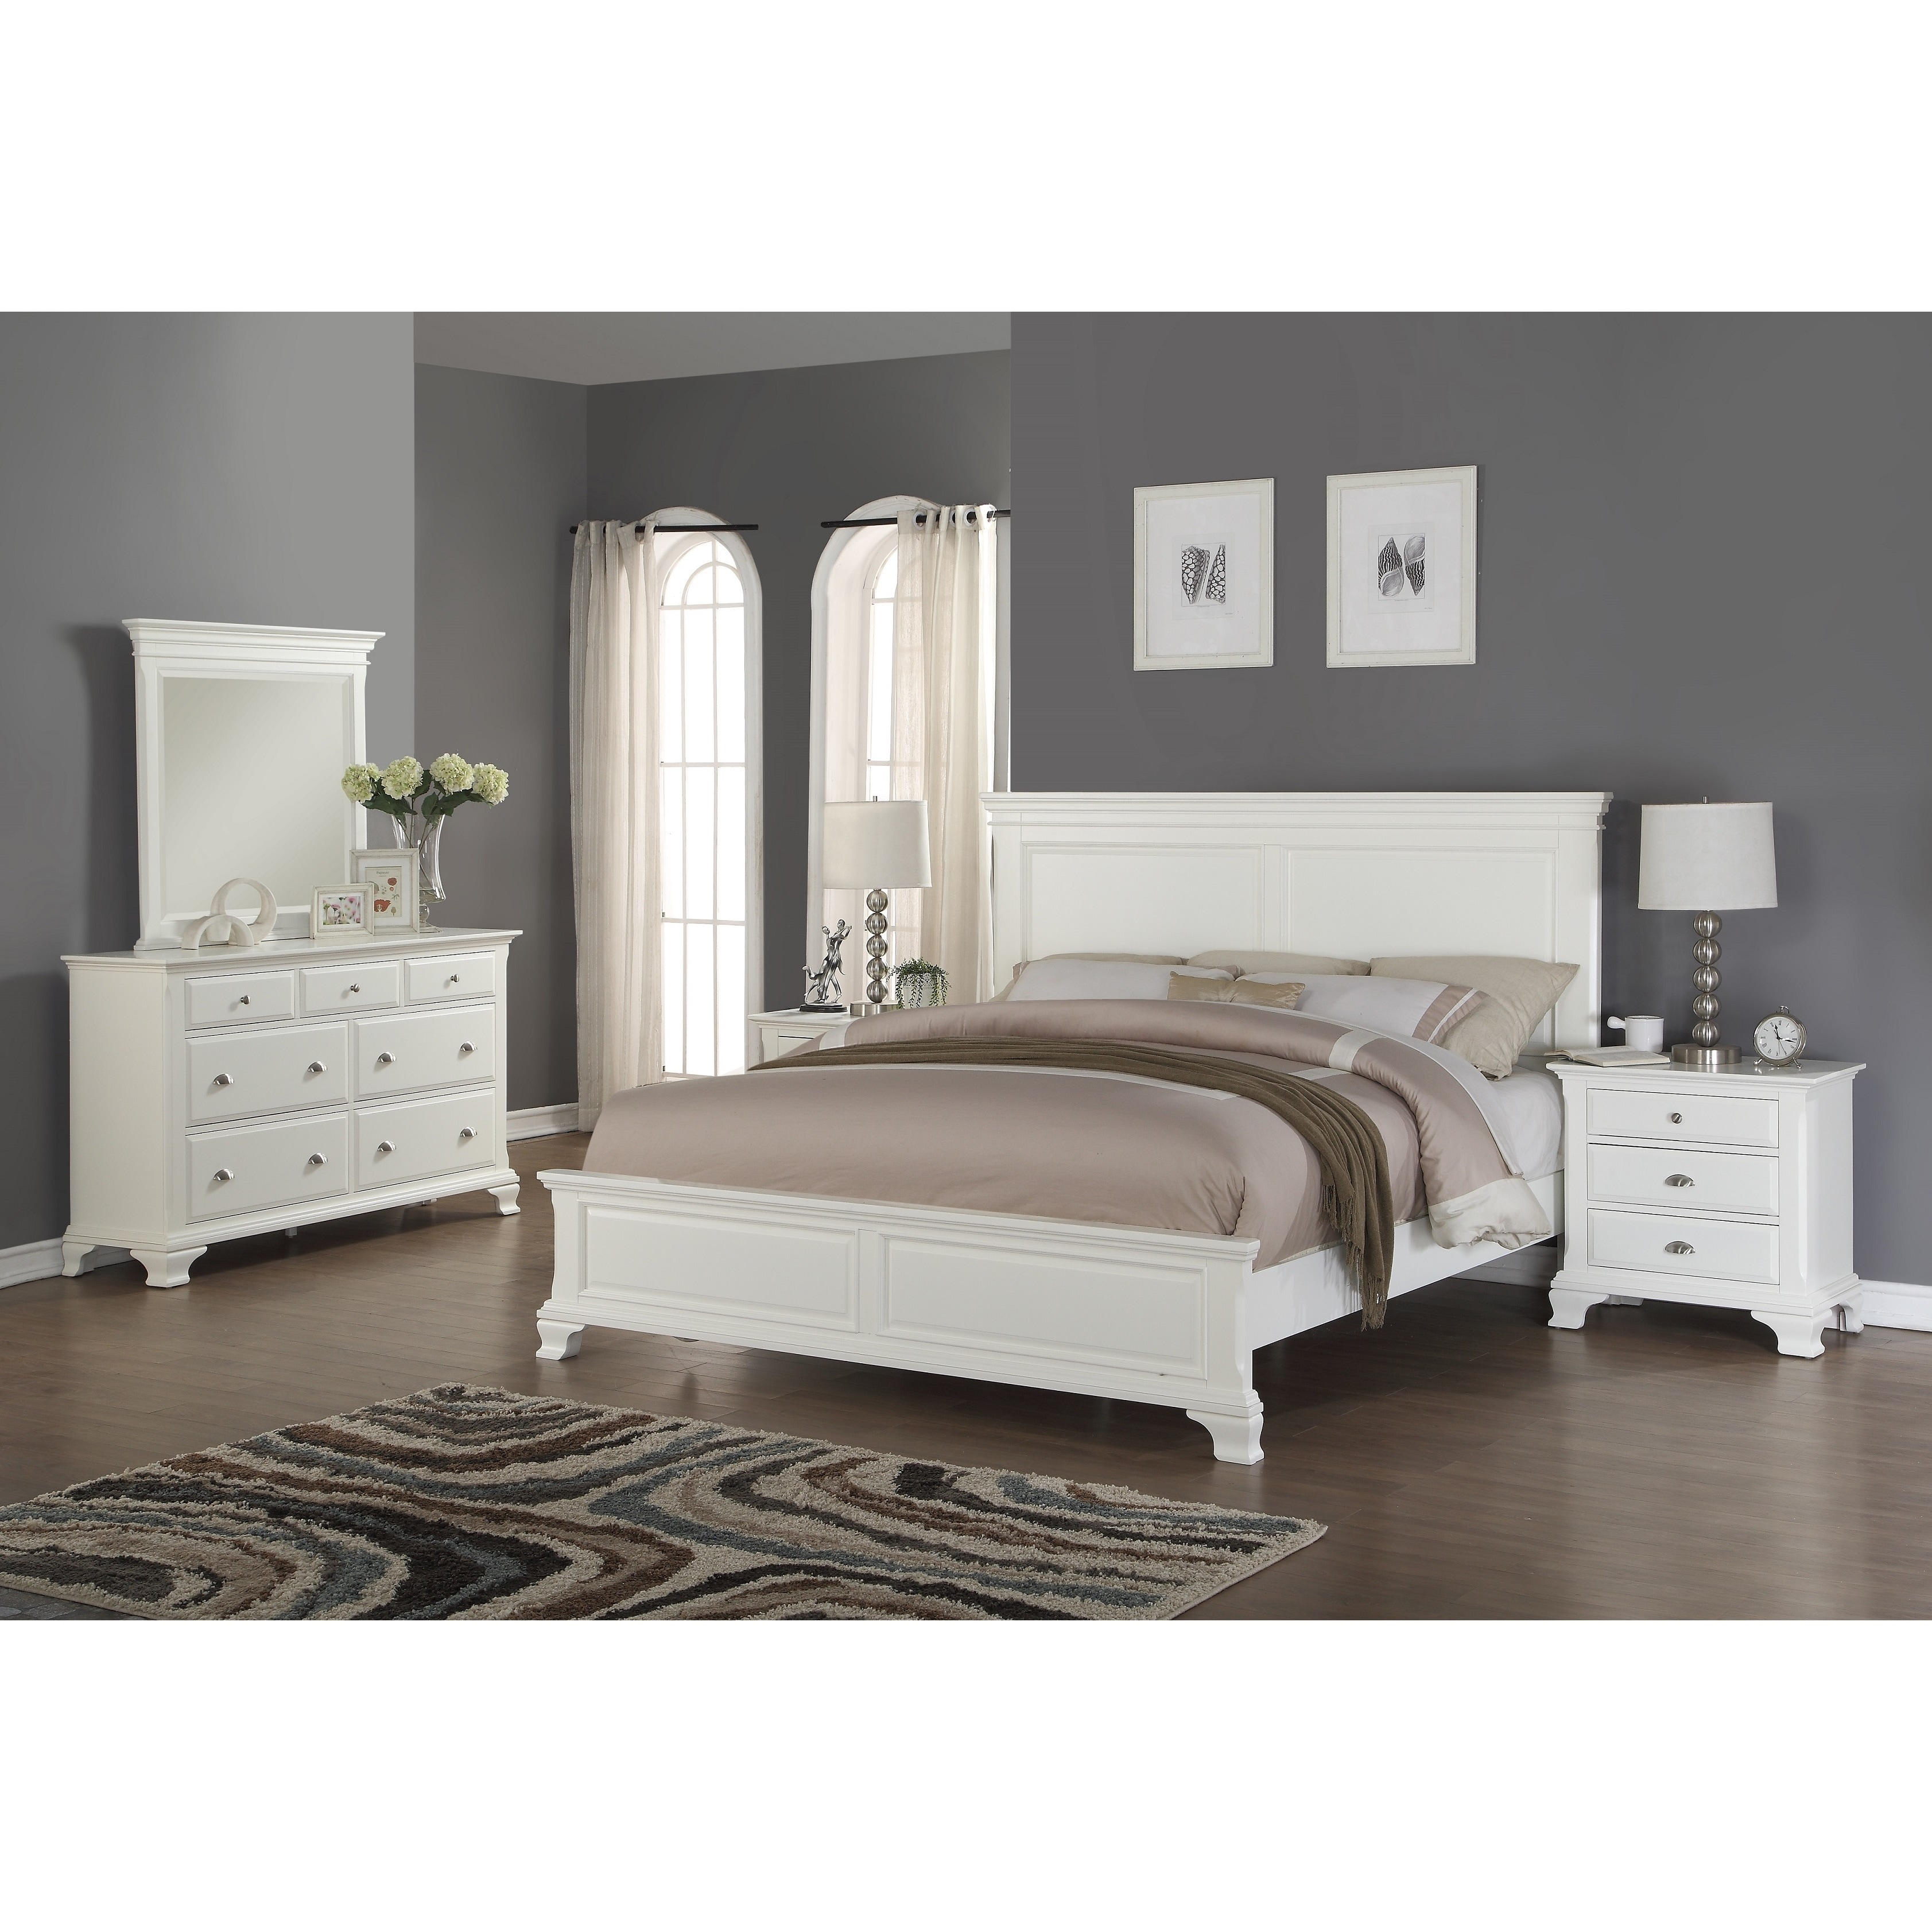 Shop Laveno 012 White Wood Bedroom Furniture